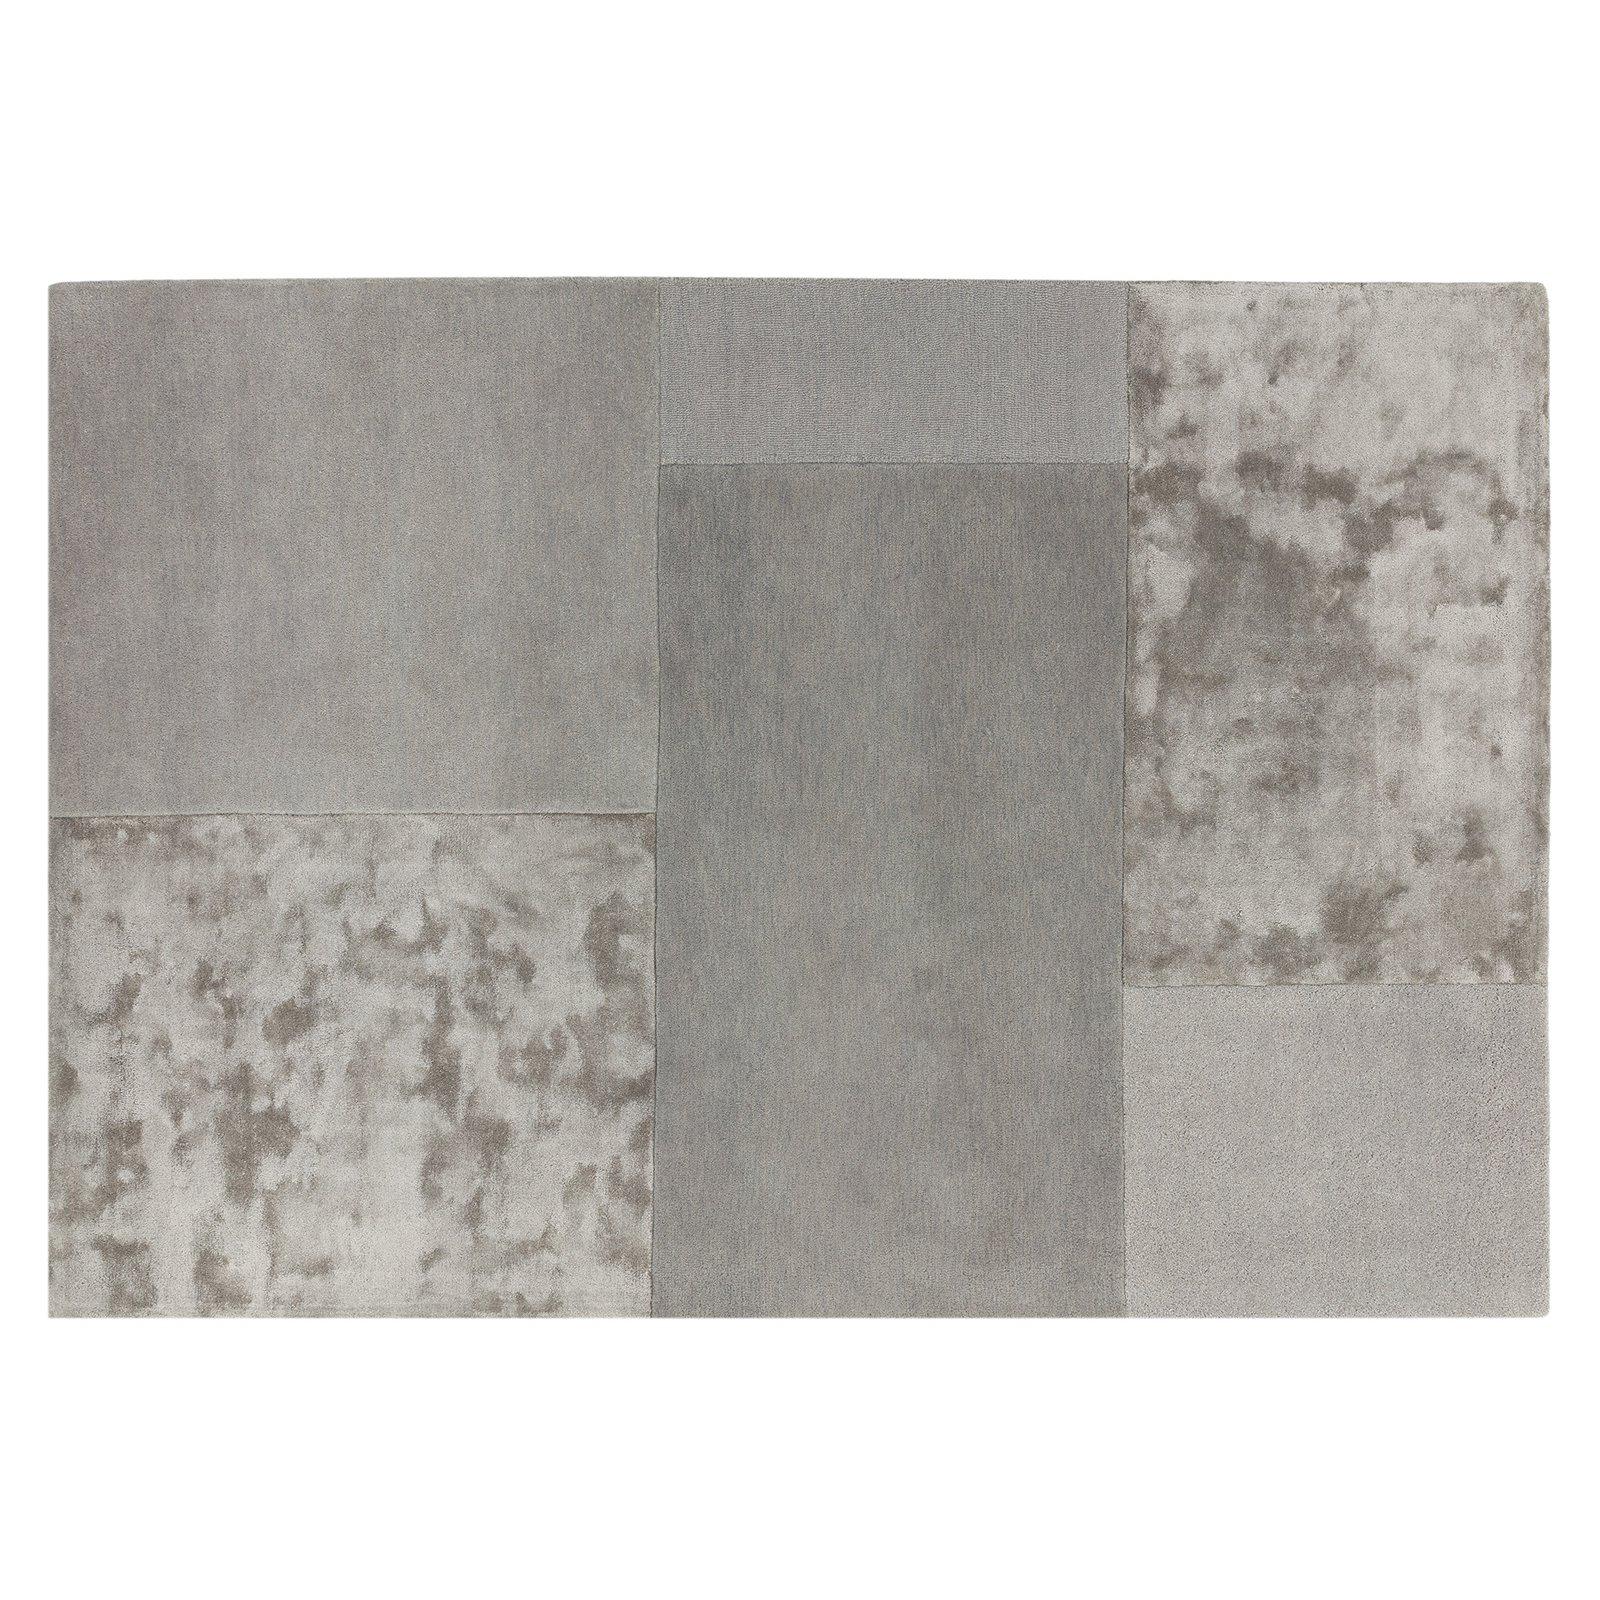 image-Tatler Hand-tufted Wool Rug, 120 x170 cm, Silver